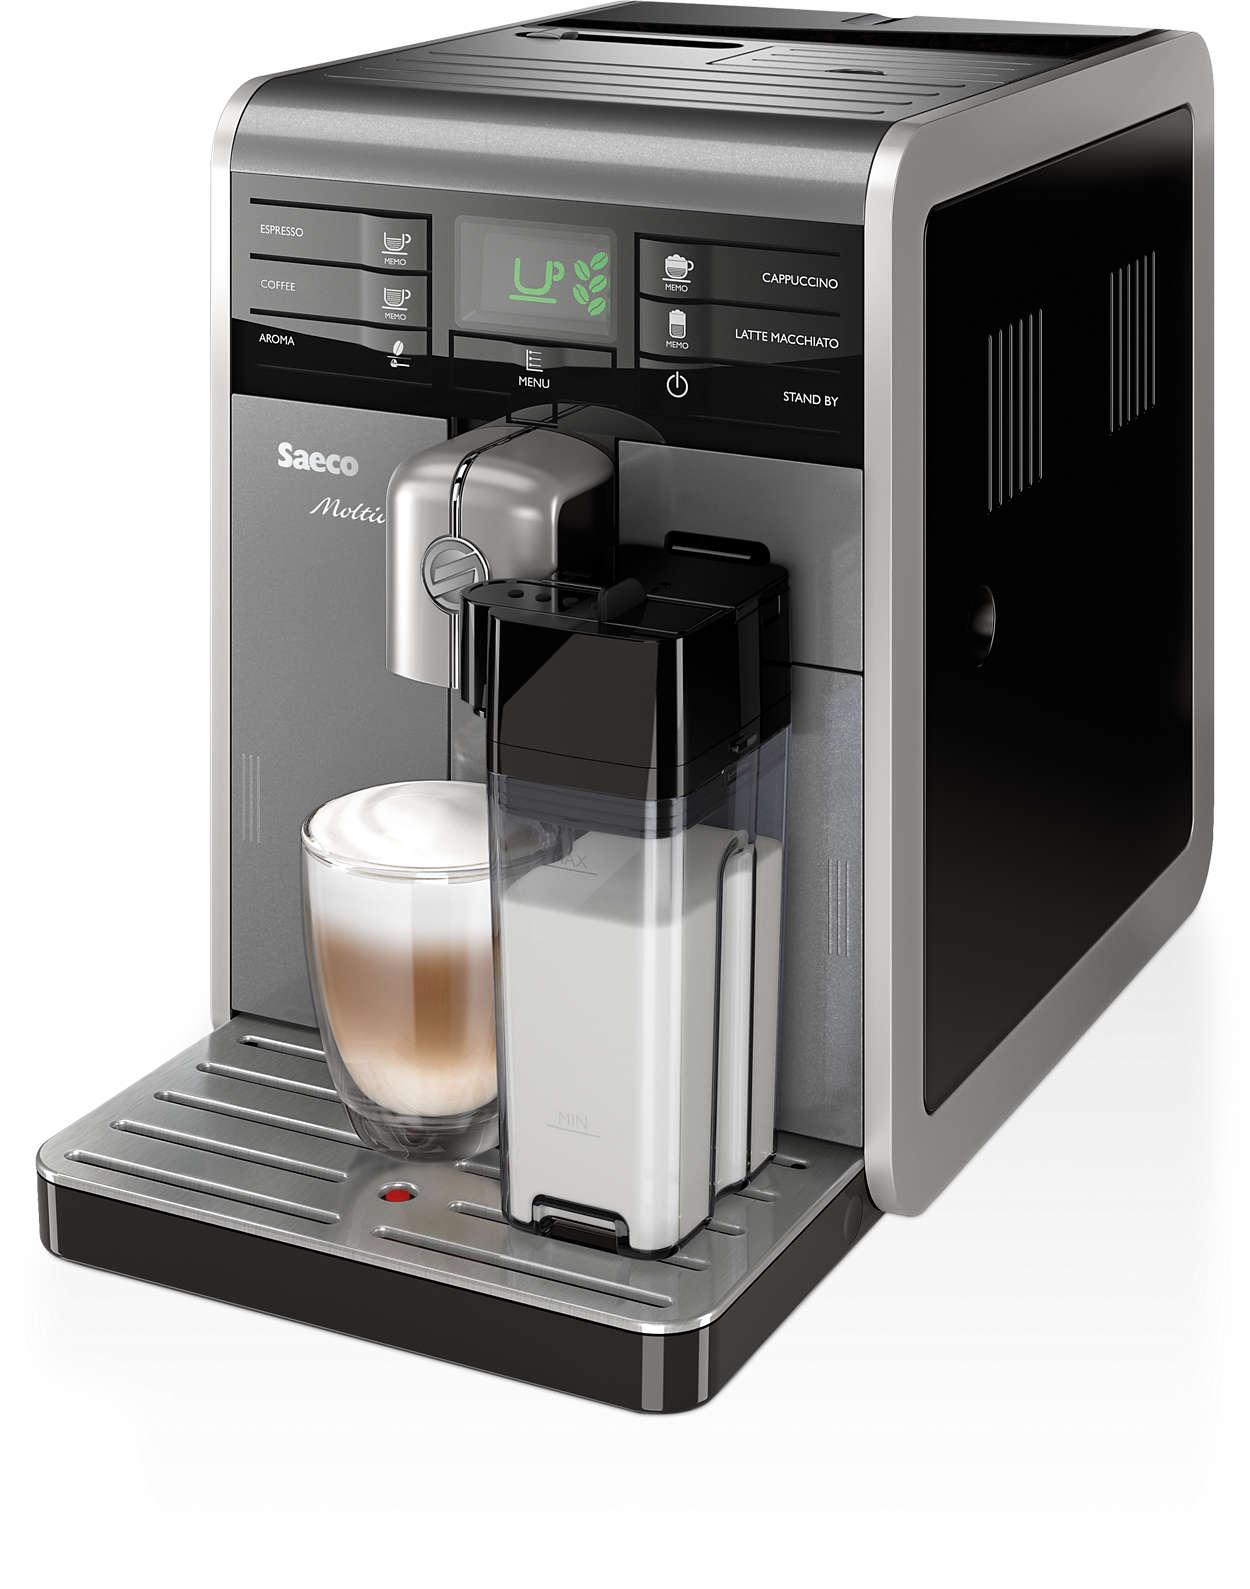 Jeder Moment verdient seinen perfekten Kaffeegeschmack